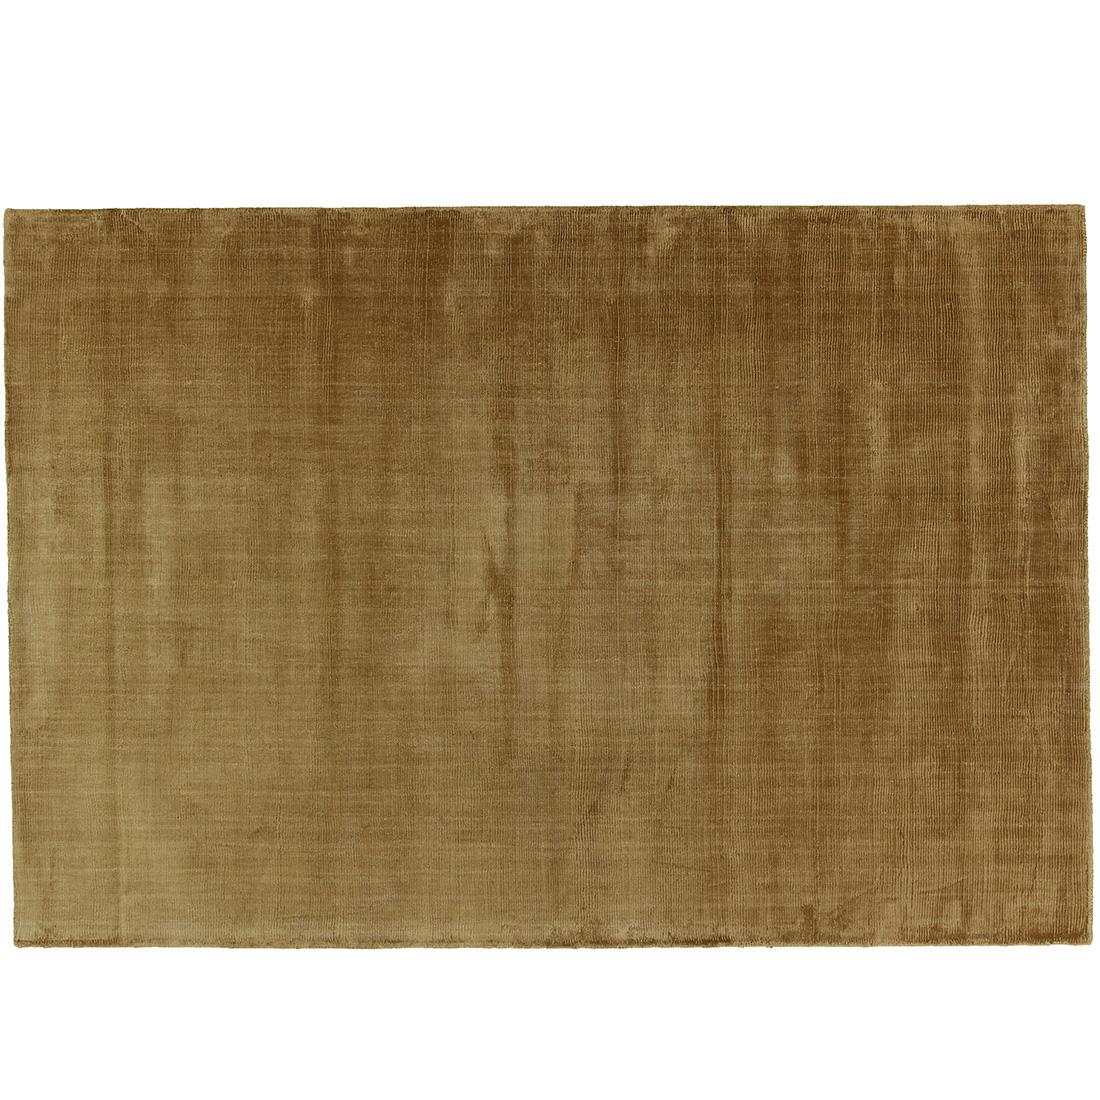 Vloerkleed Brinker Oyster Gold | 170 x 230 cm